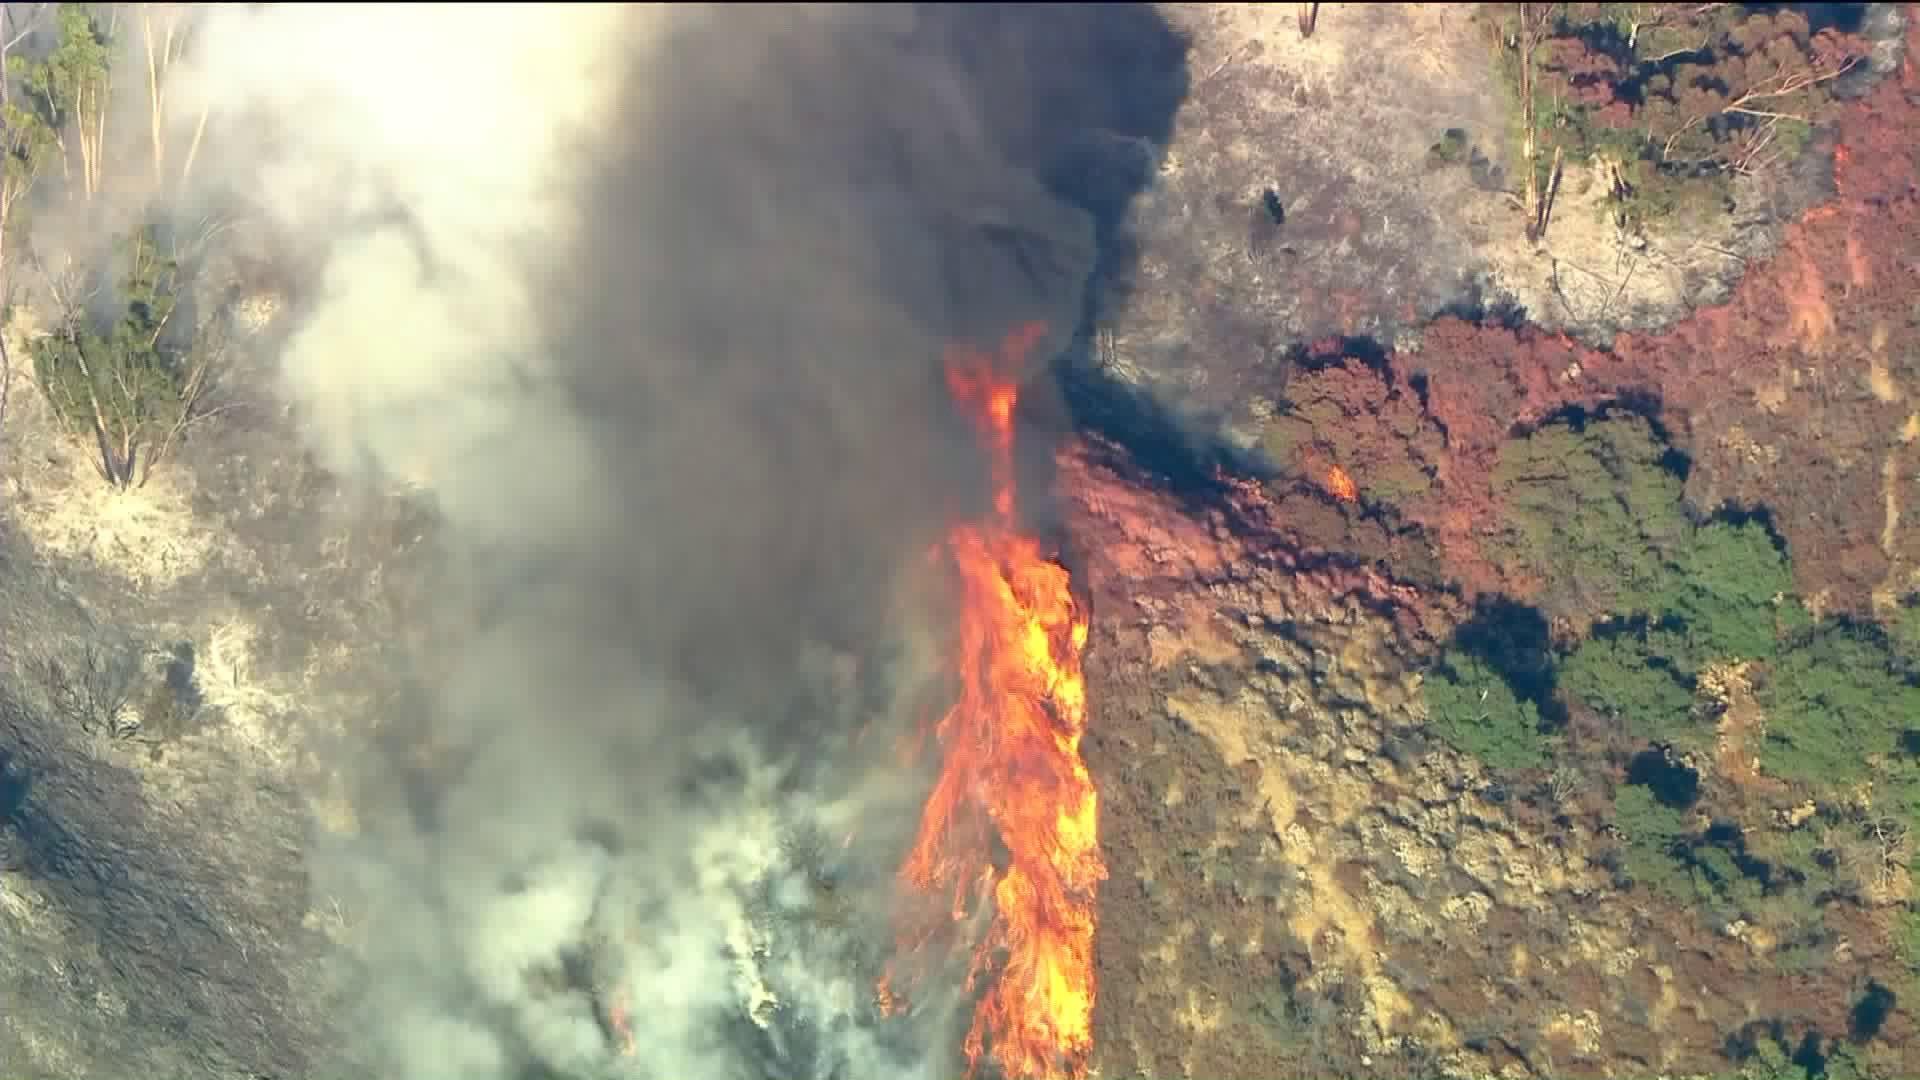 The Skyline Fire was burning in Corona on Aug. 13, 2020. (KTLA)